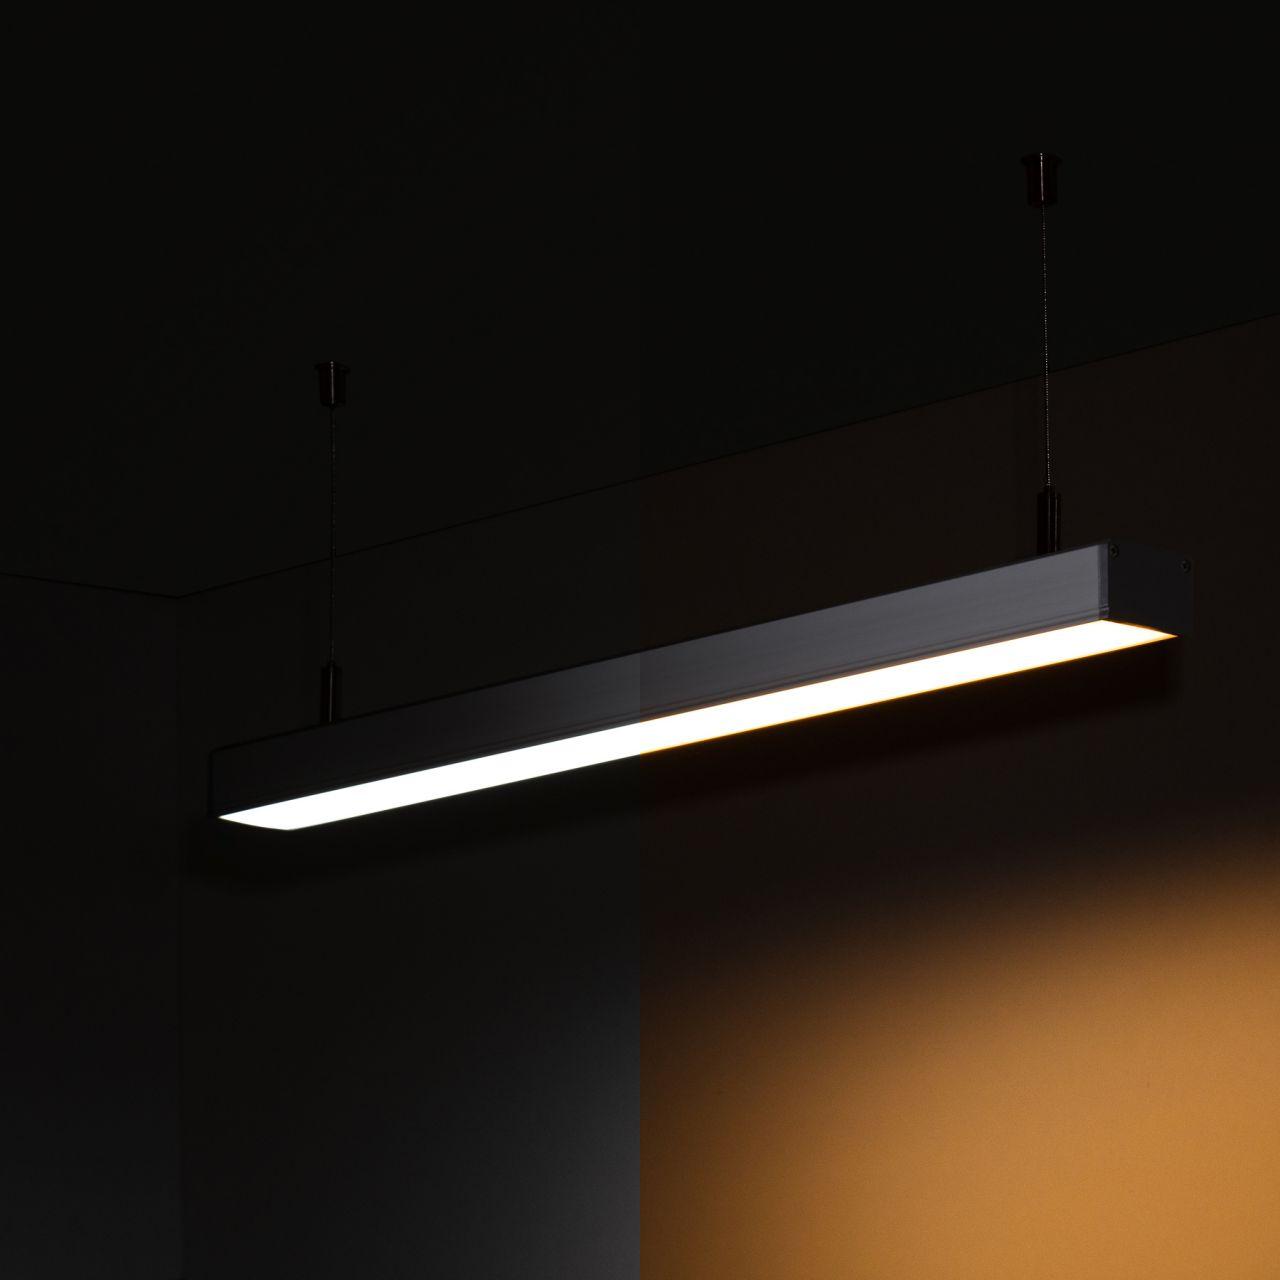 24V Aluminium LED Pendelleuchte – Farbtemperatur einstellbar – linear – diffuse Abdeckung